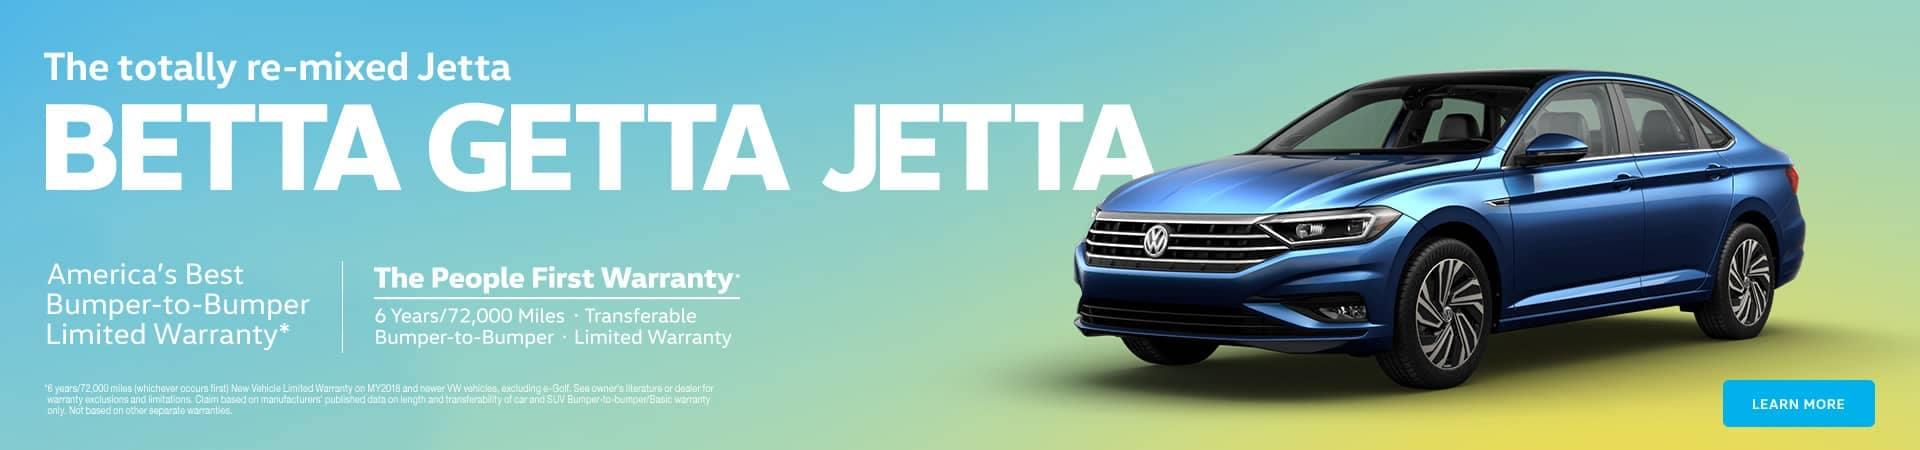 betta-jetta-banner